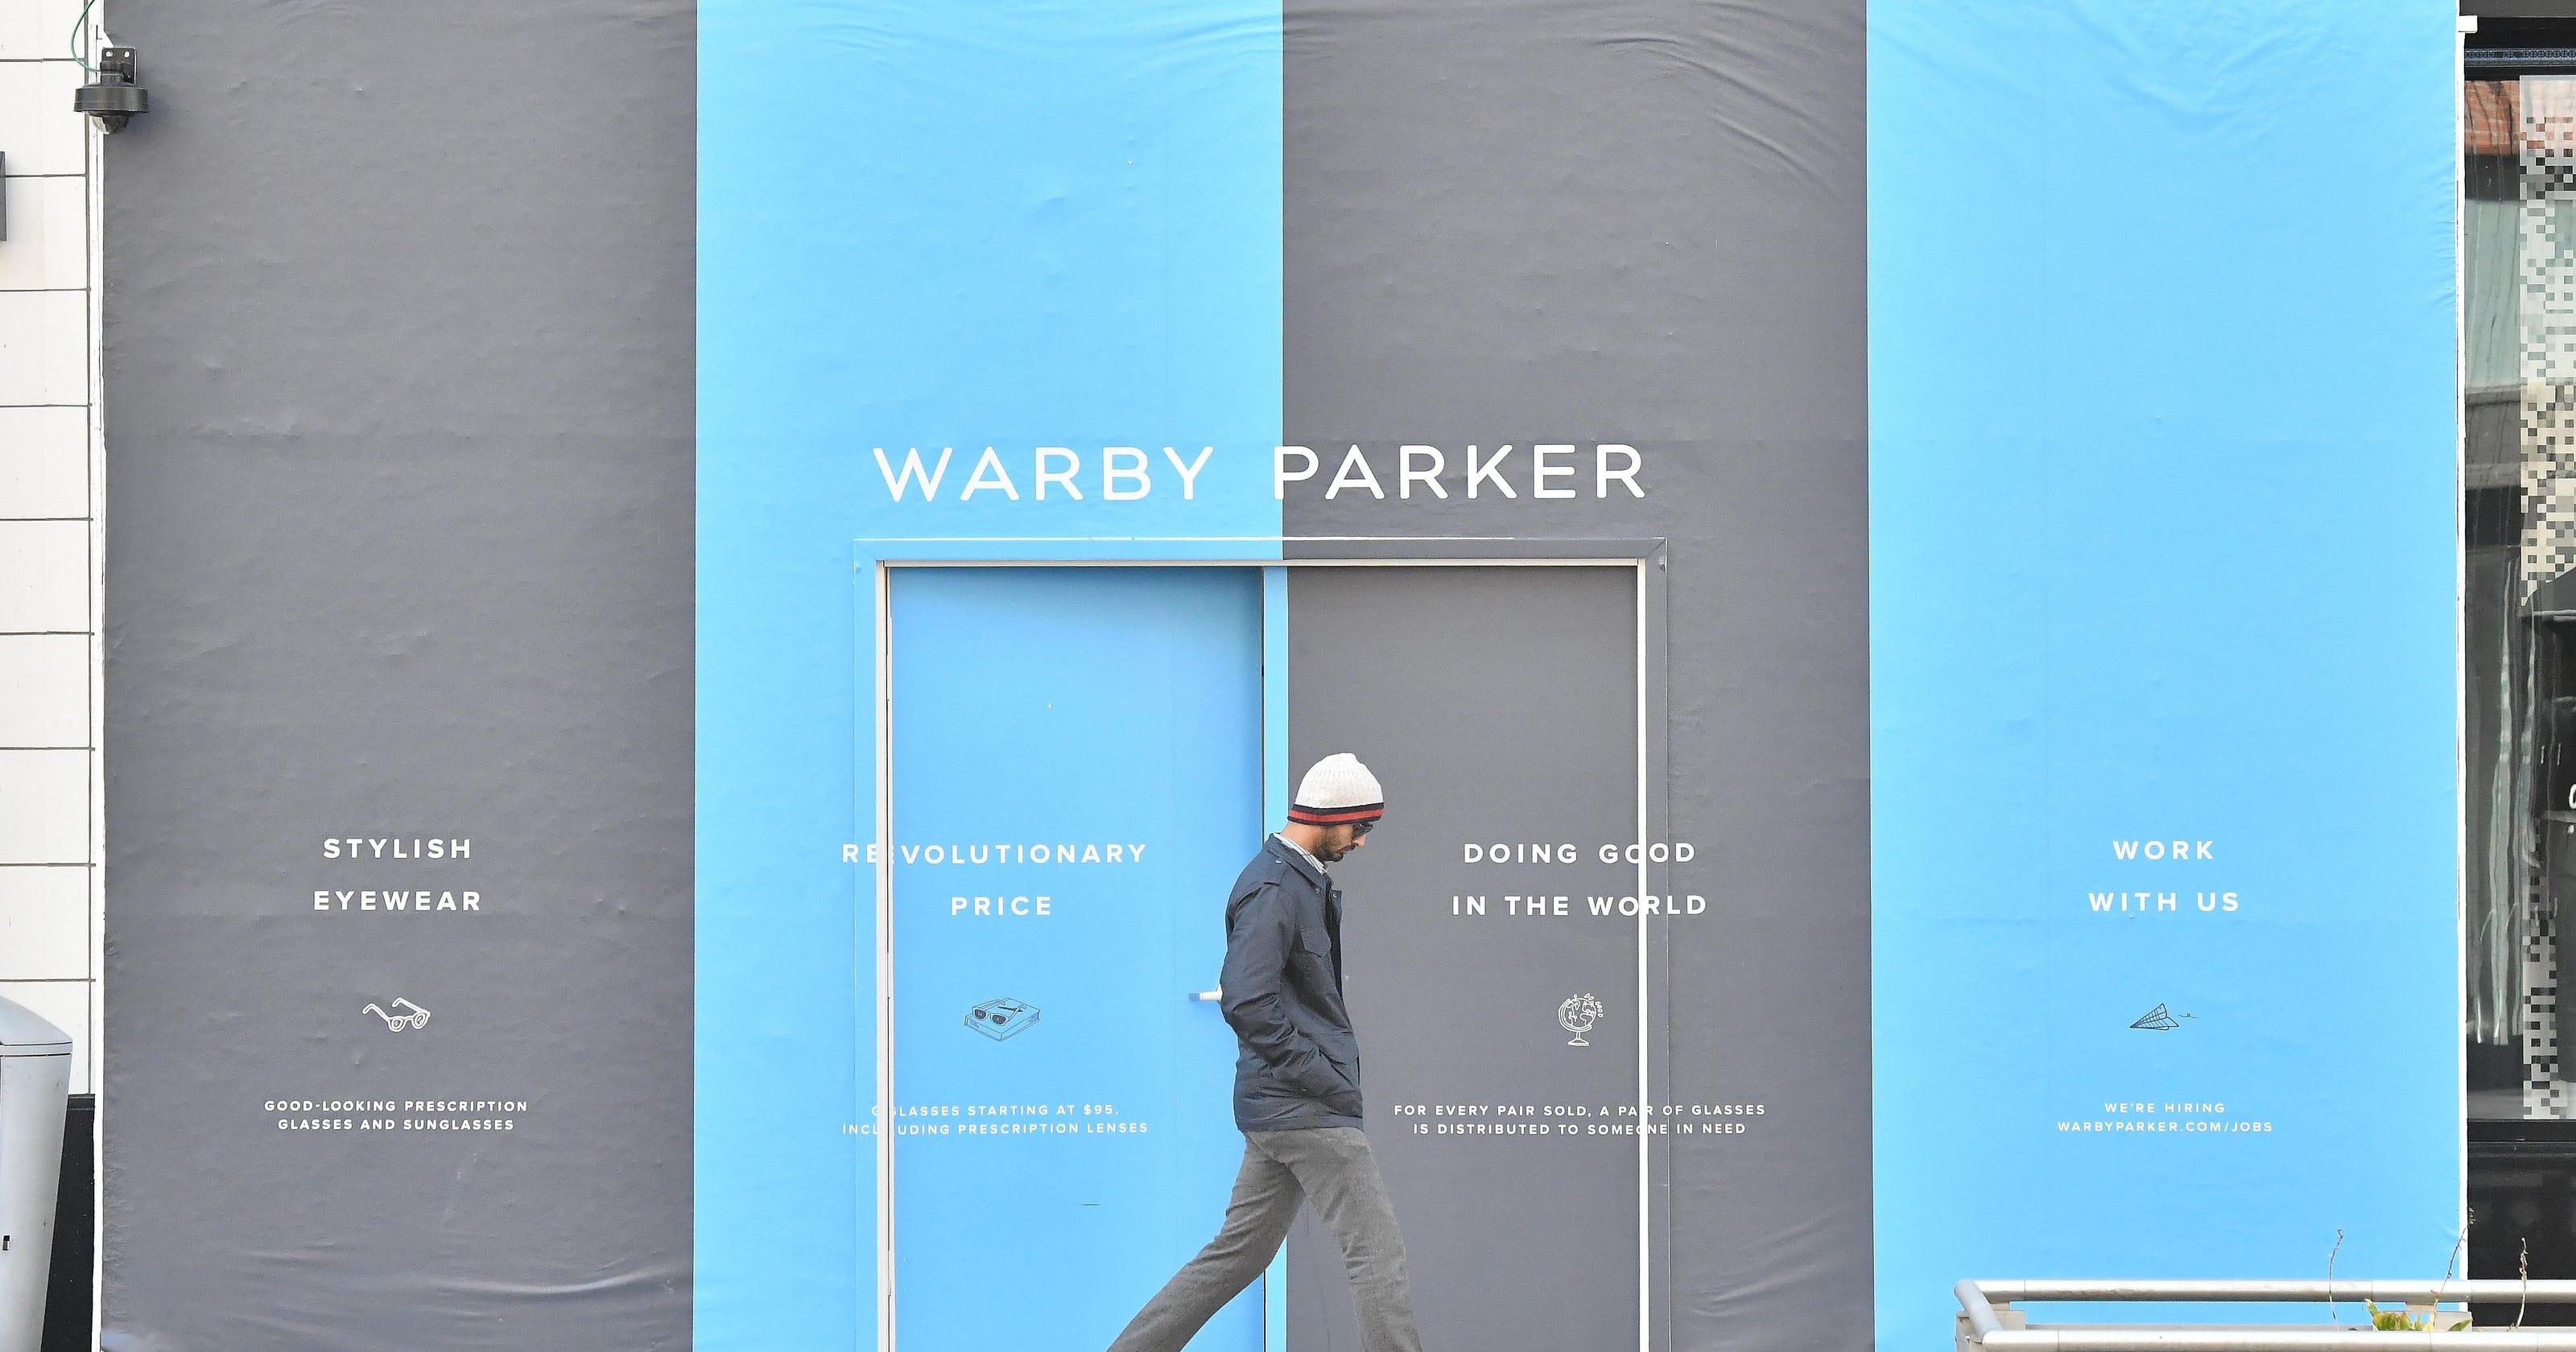 Warby Parker opening Nov  26 in Detroit